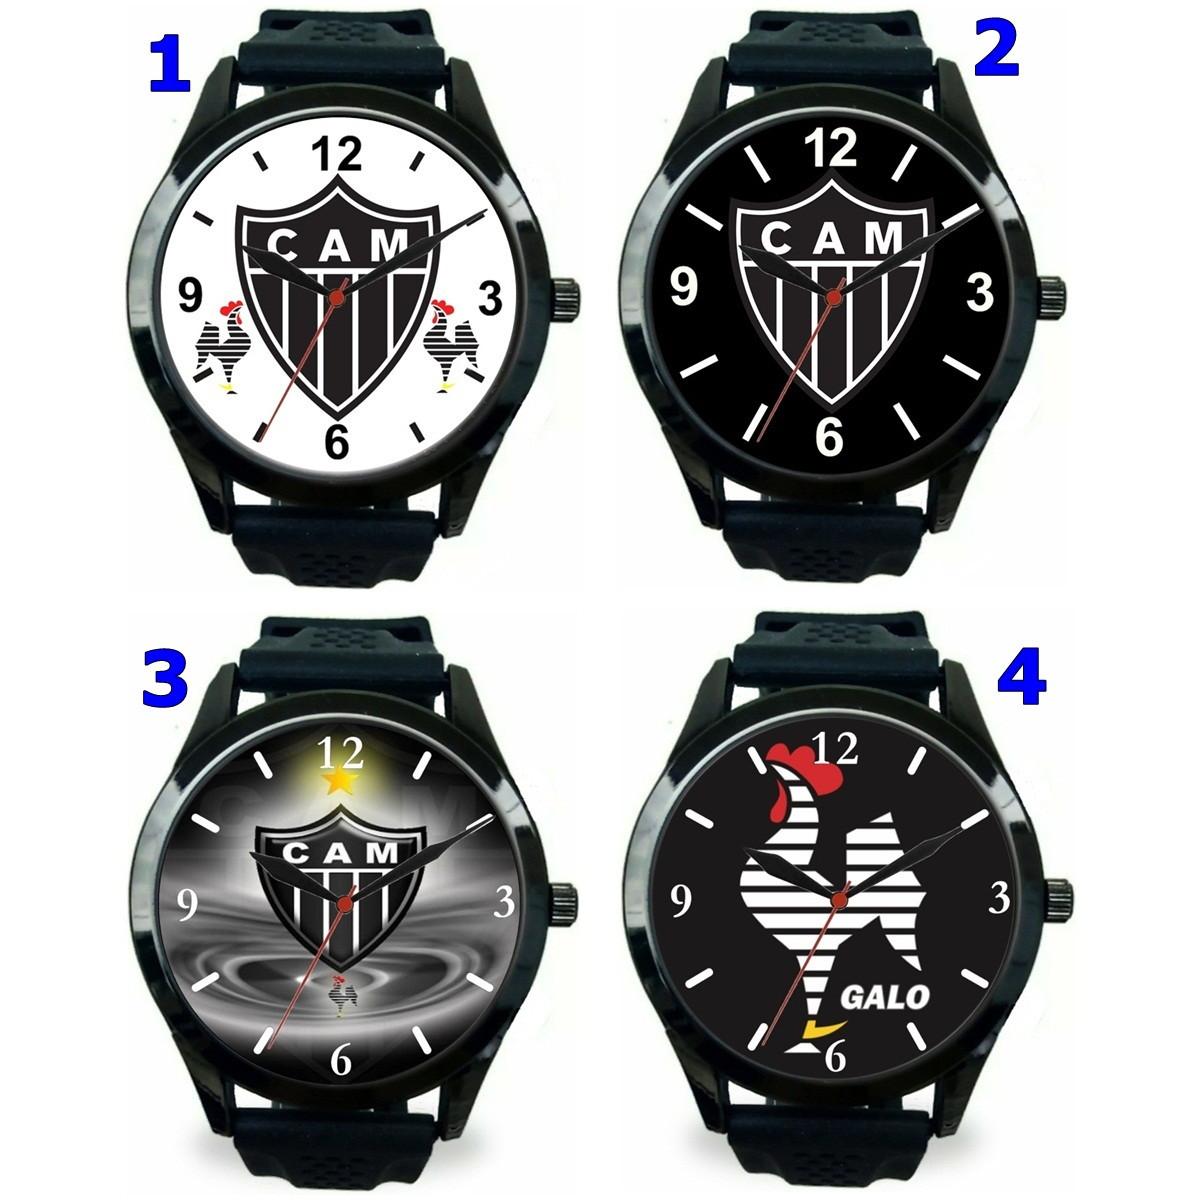 d455f24ce04 1 Relógio pulso personalizado esportivo Atlético MG barato no Elo7 ...